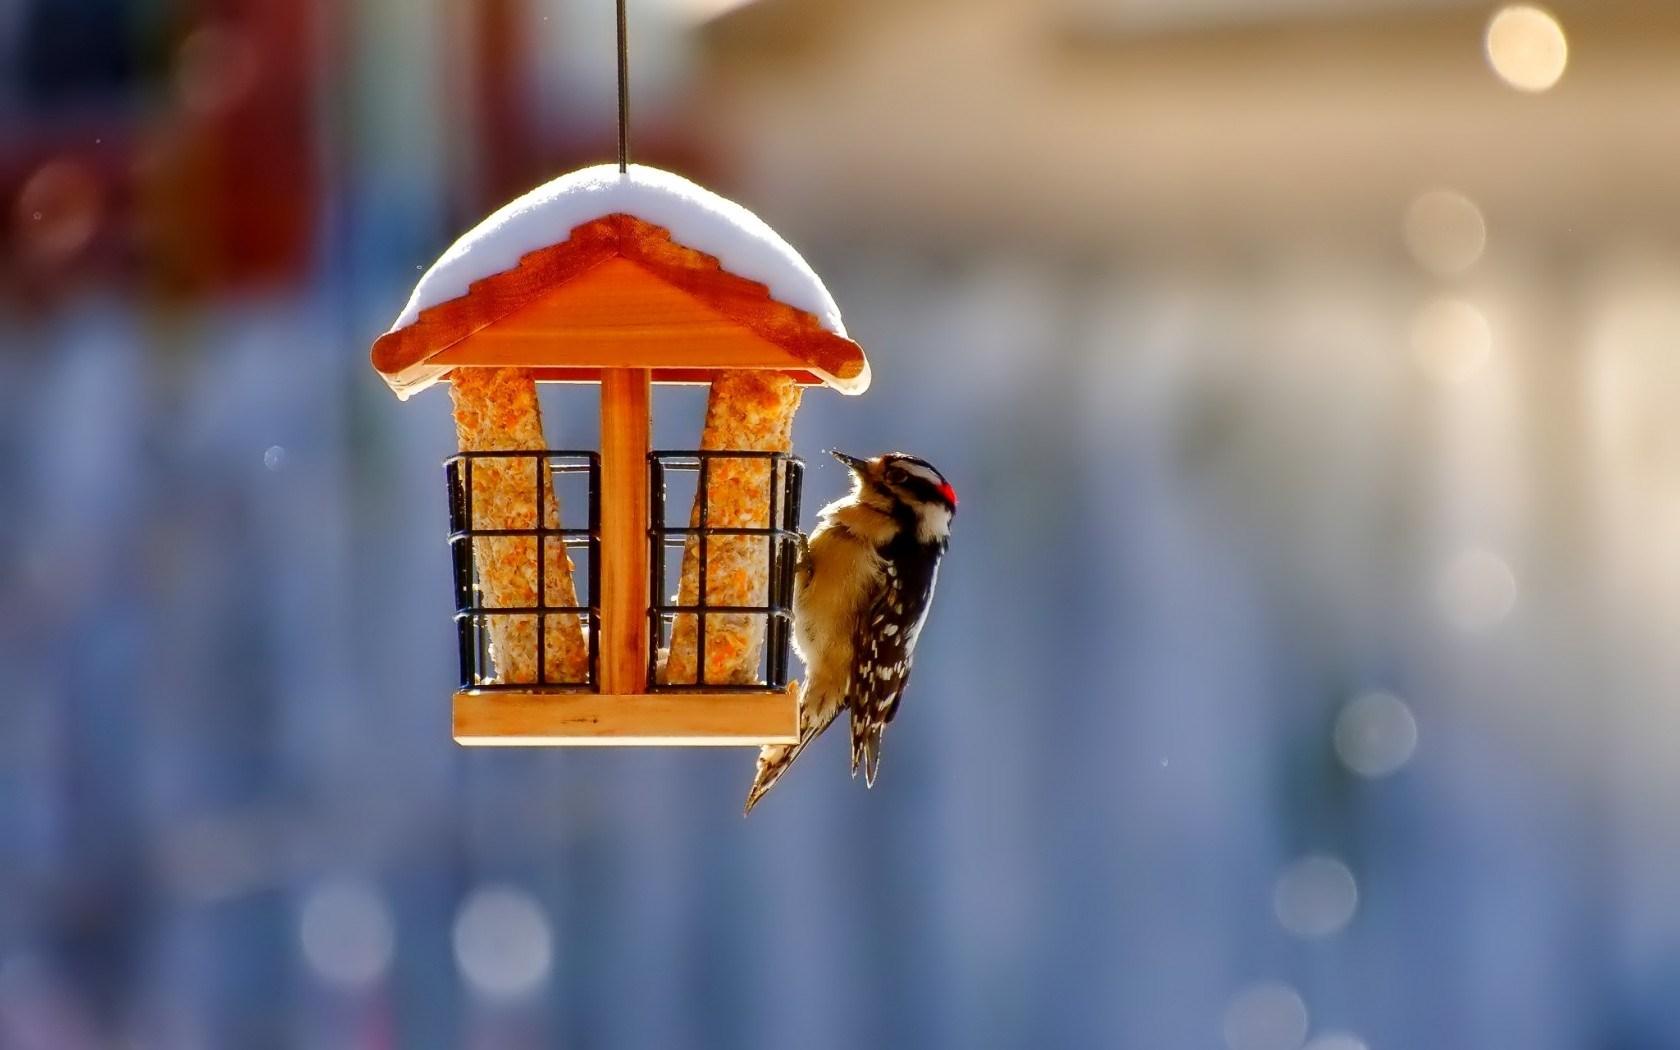 birdhouse beautiful wallpaper